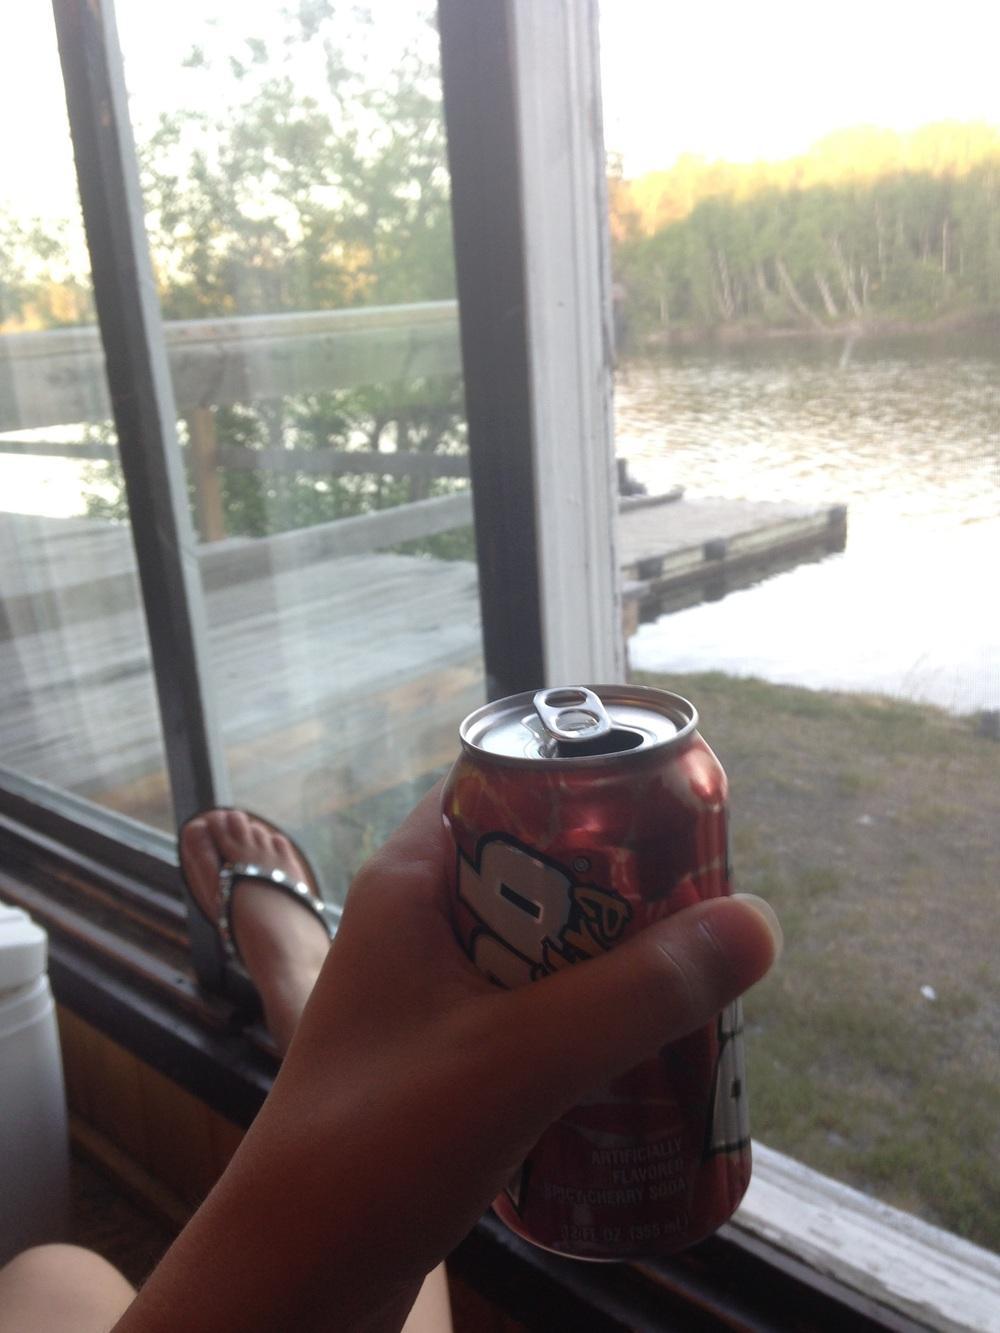 Ashlee-Looking-at-View-Drinking-Pibb.jpg